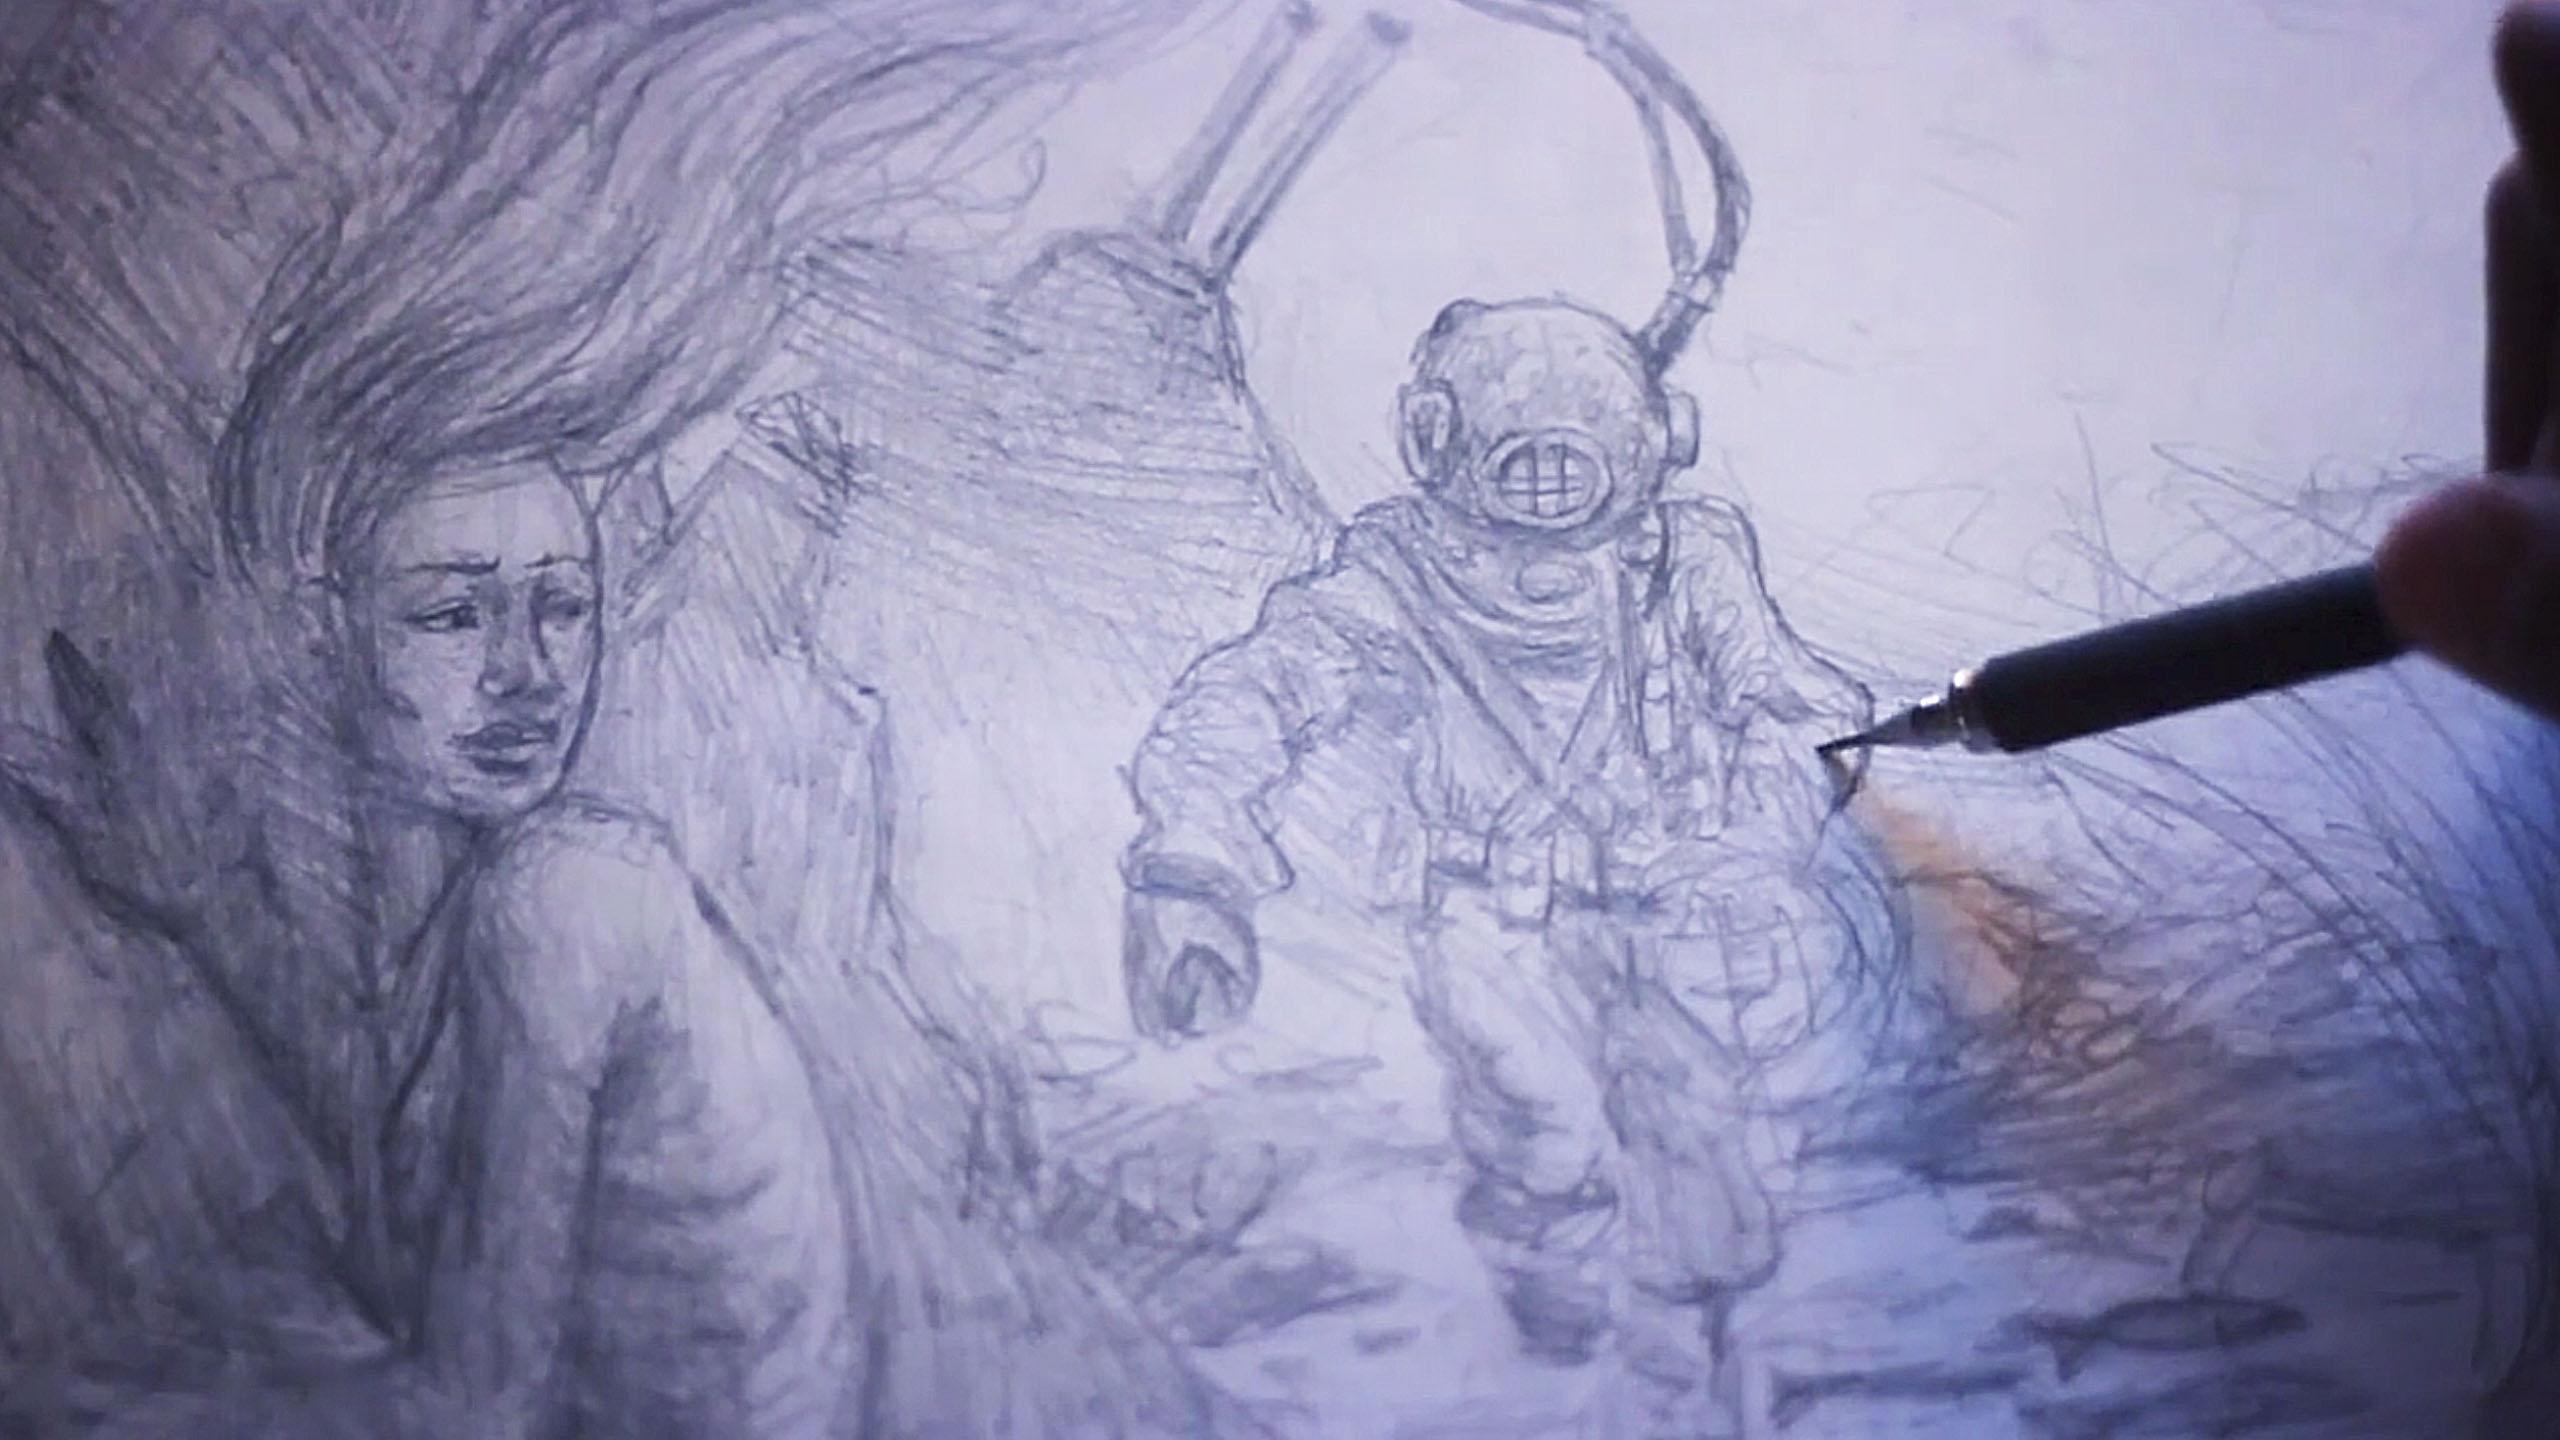 1_Retouching_Academy_LightFarmStudios_Mermaids_sketch_1